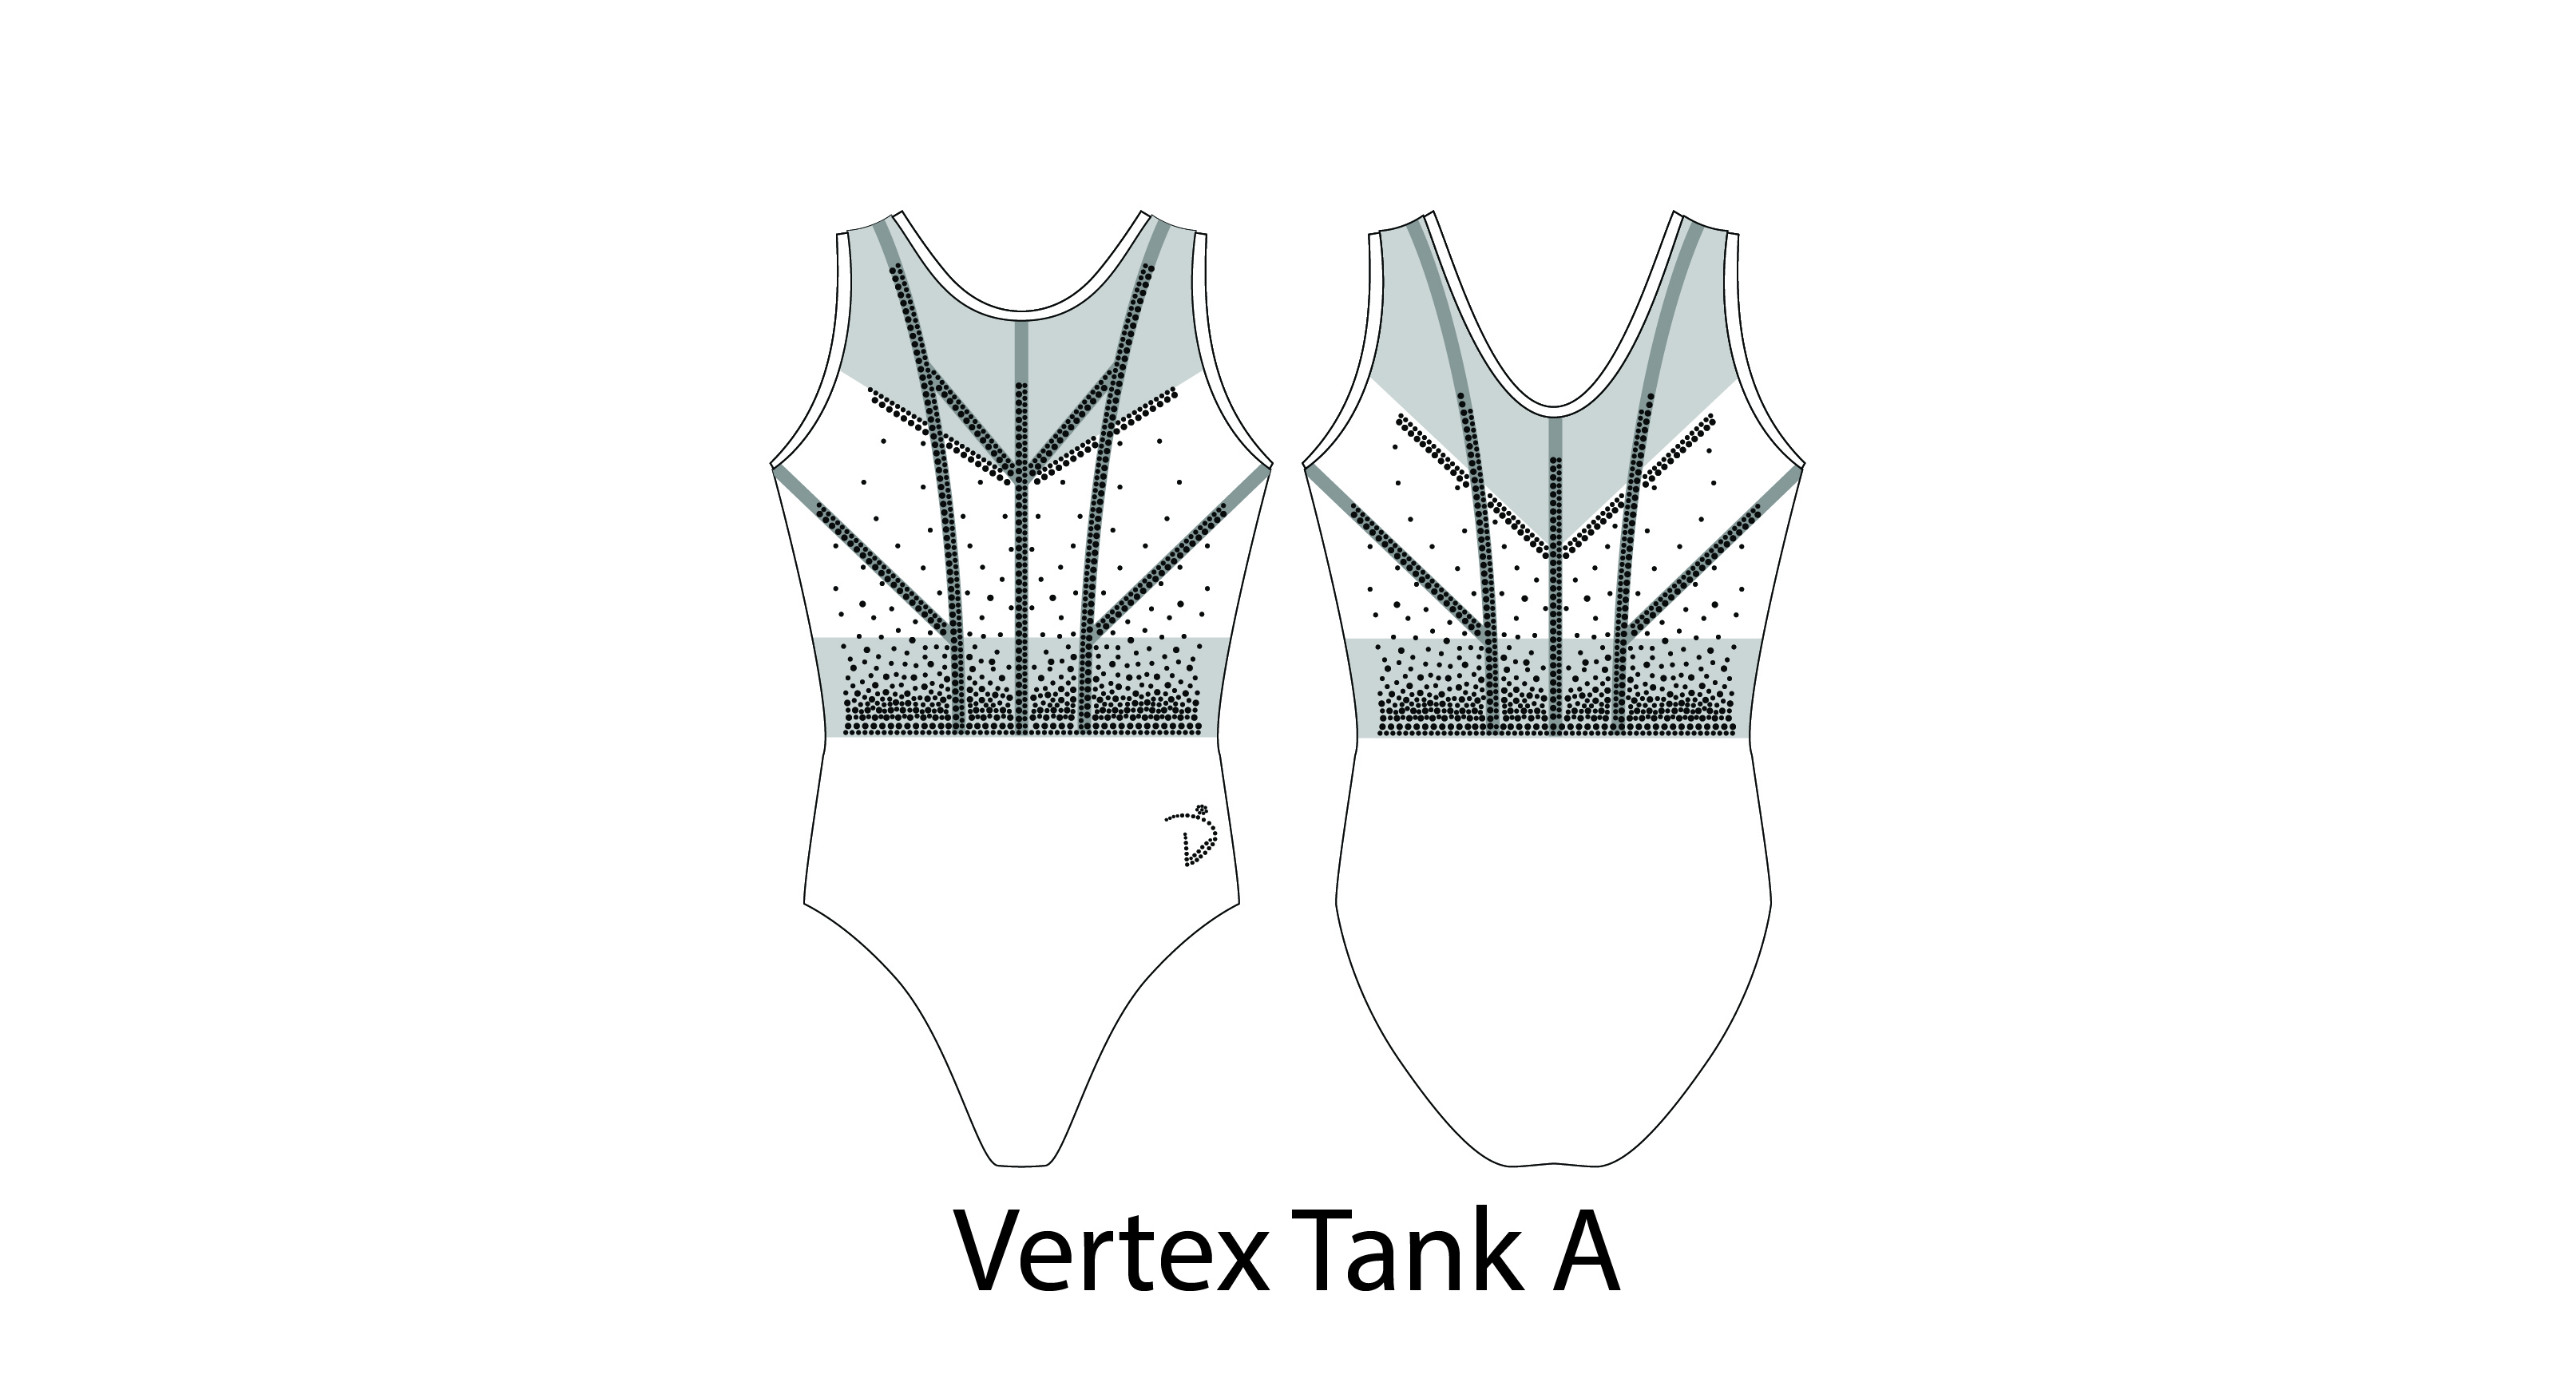 Vertex Tank A